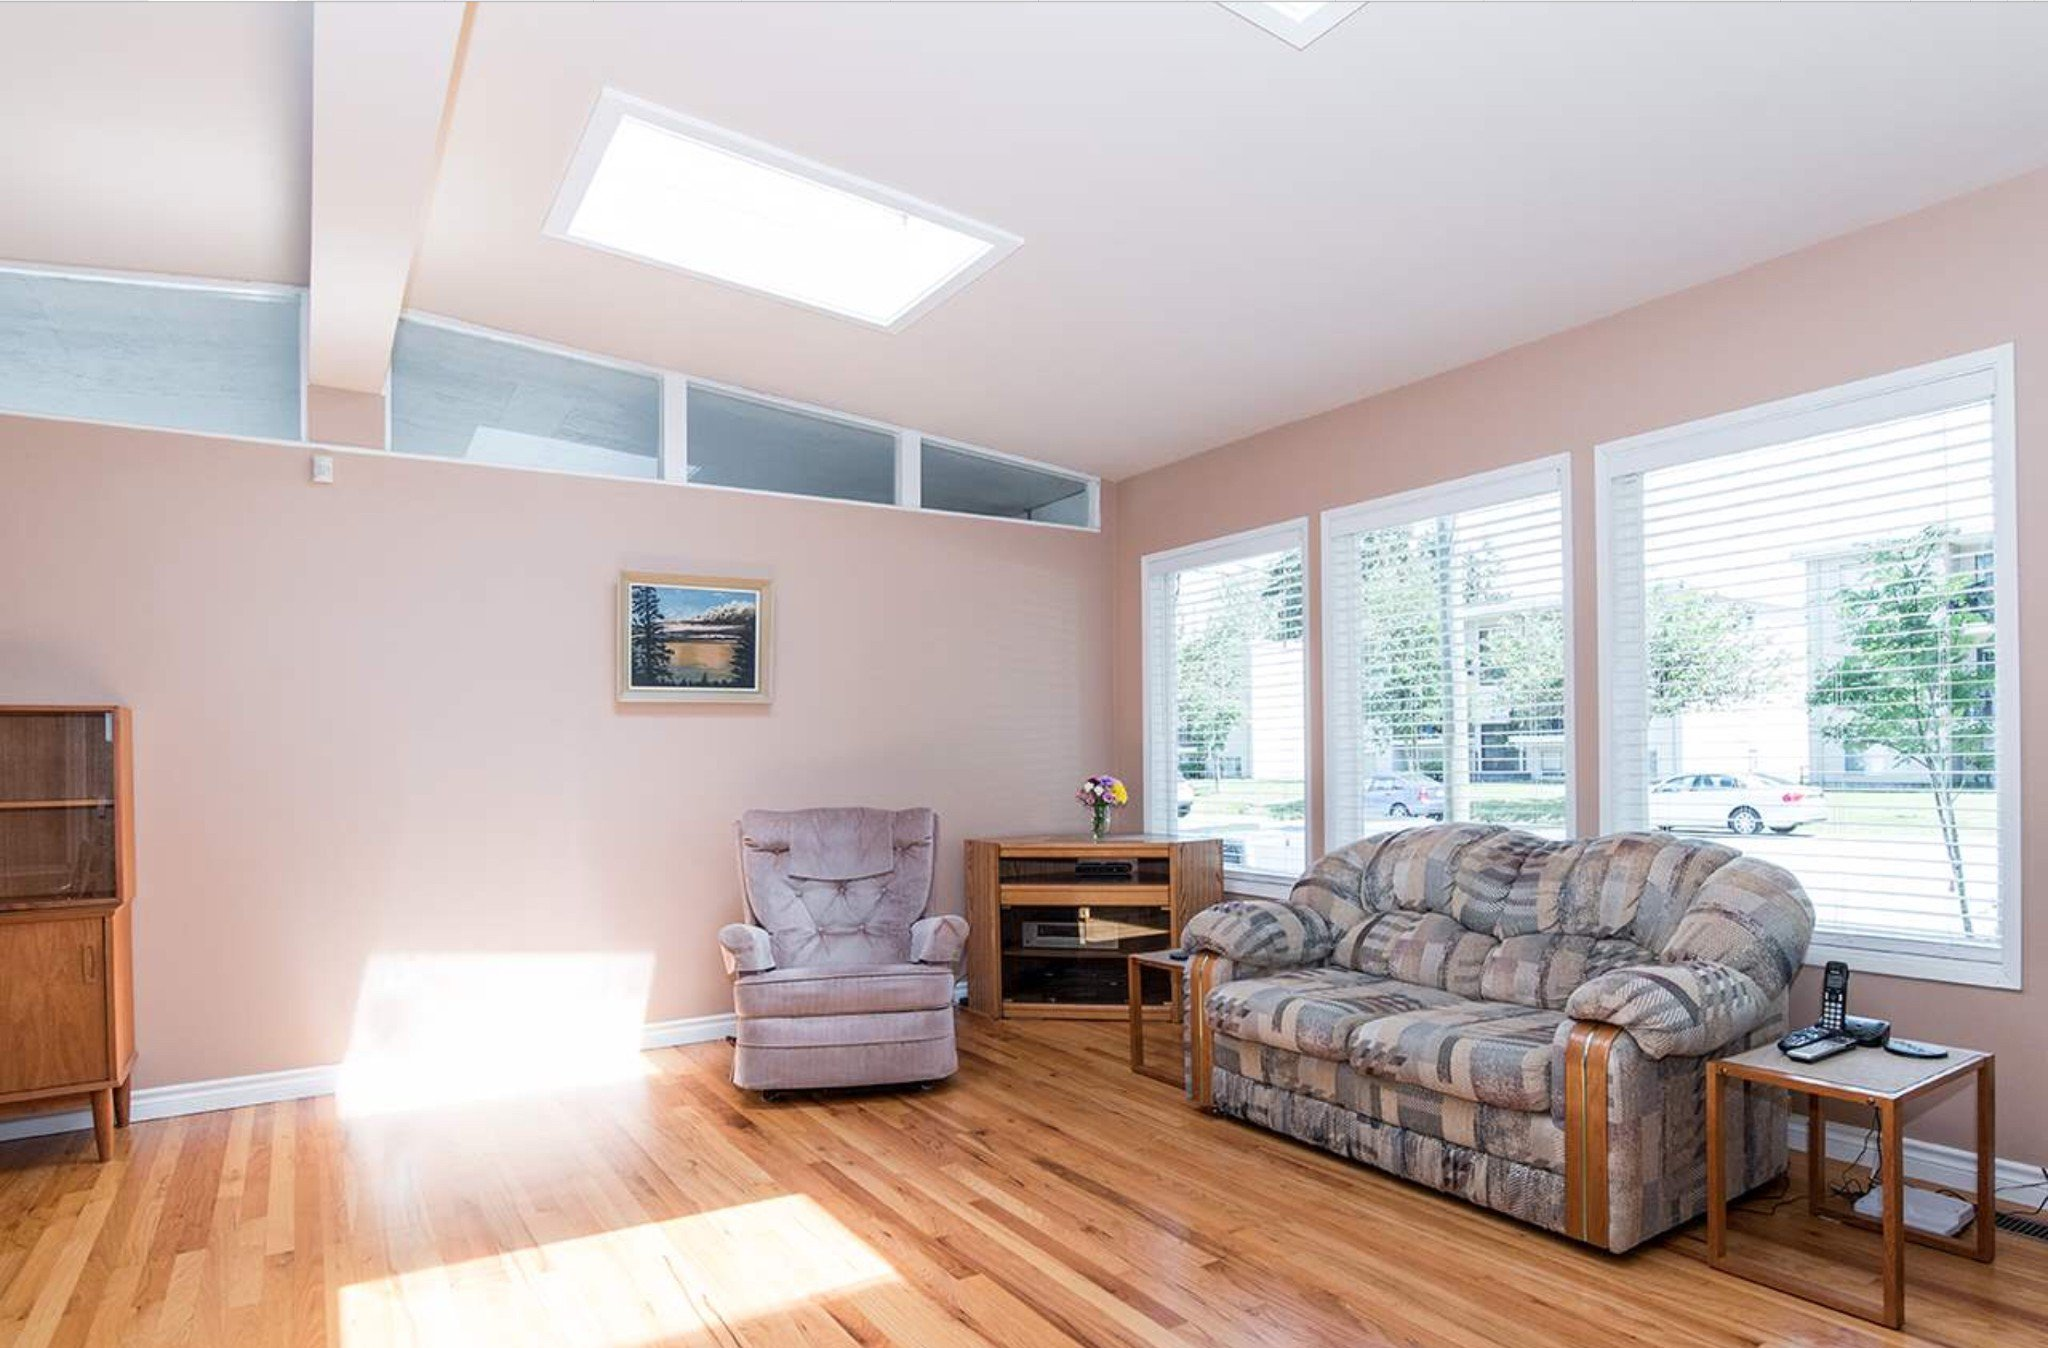 Photo 4: Photos: 10327 127A Street in Surrey: Cedar Hills House for sale : MLS®# R2178137